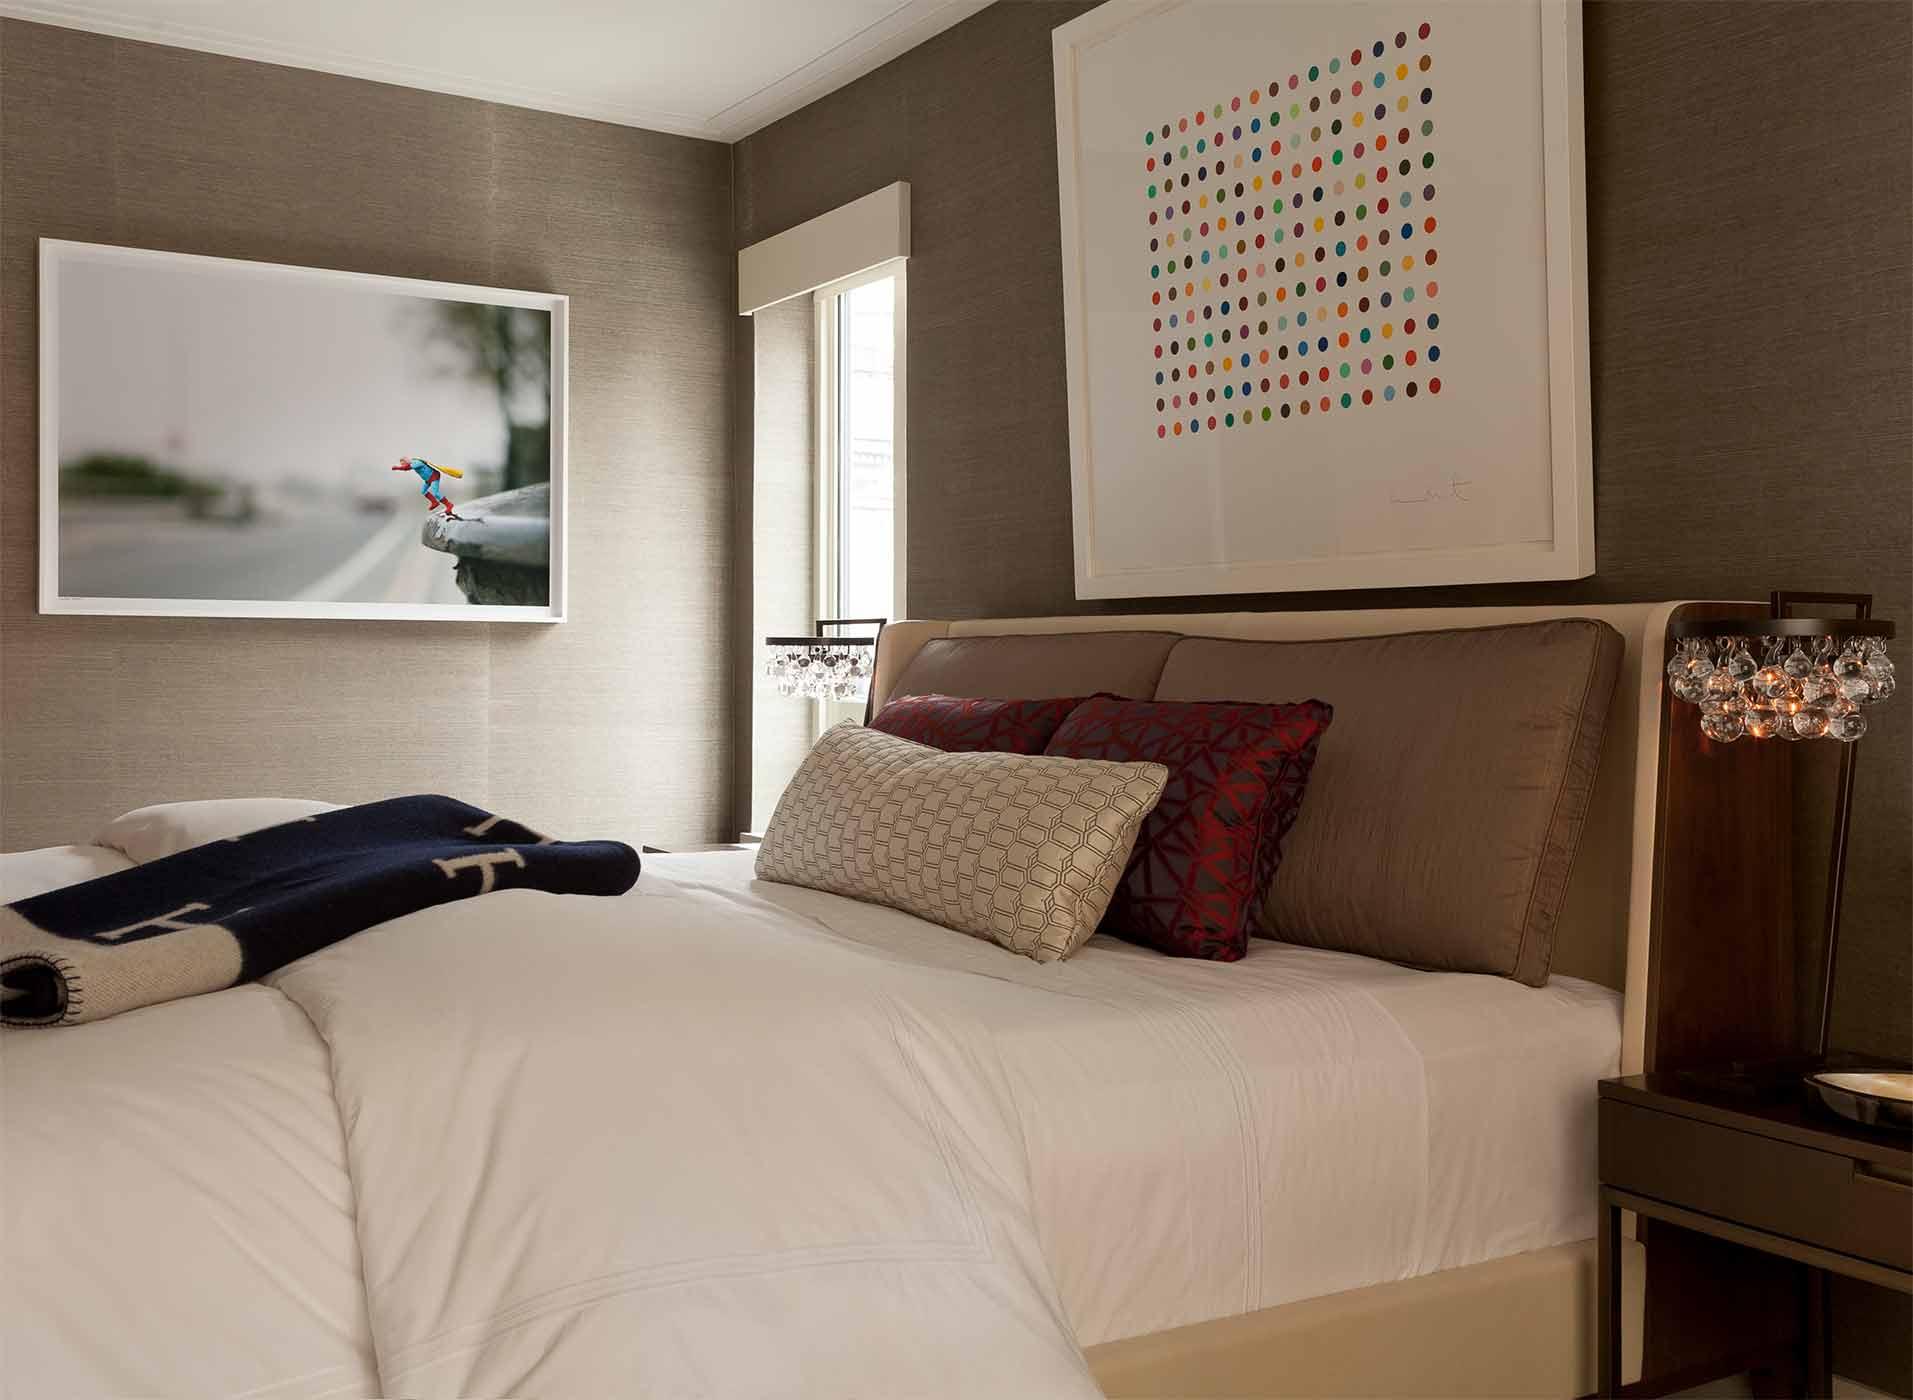 Master suite interior design by NYC's top interior design firm Darci Hether New York